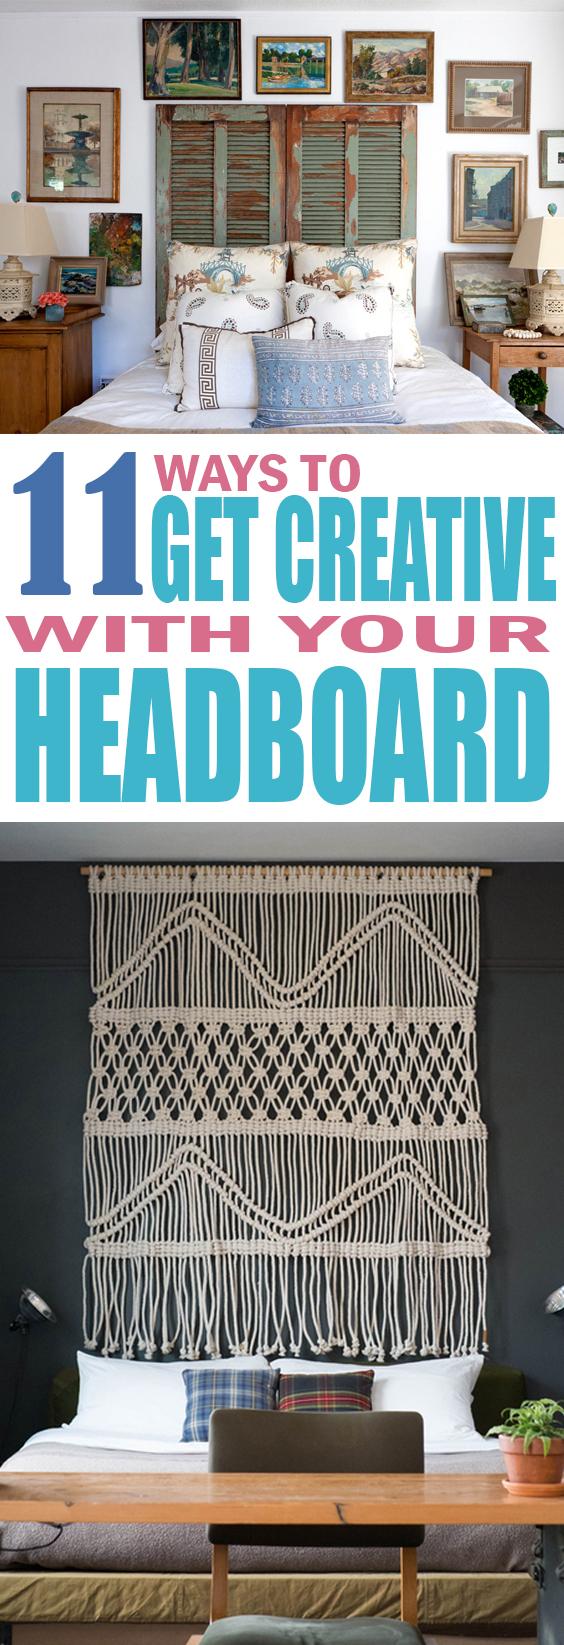 Creative Headboard DIY Ideas